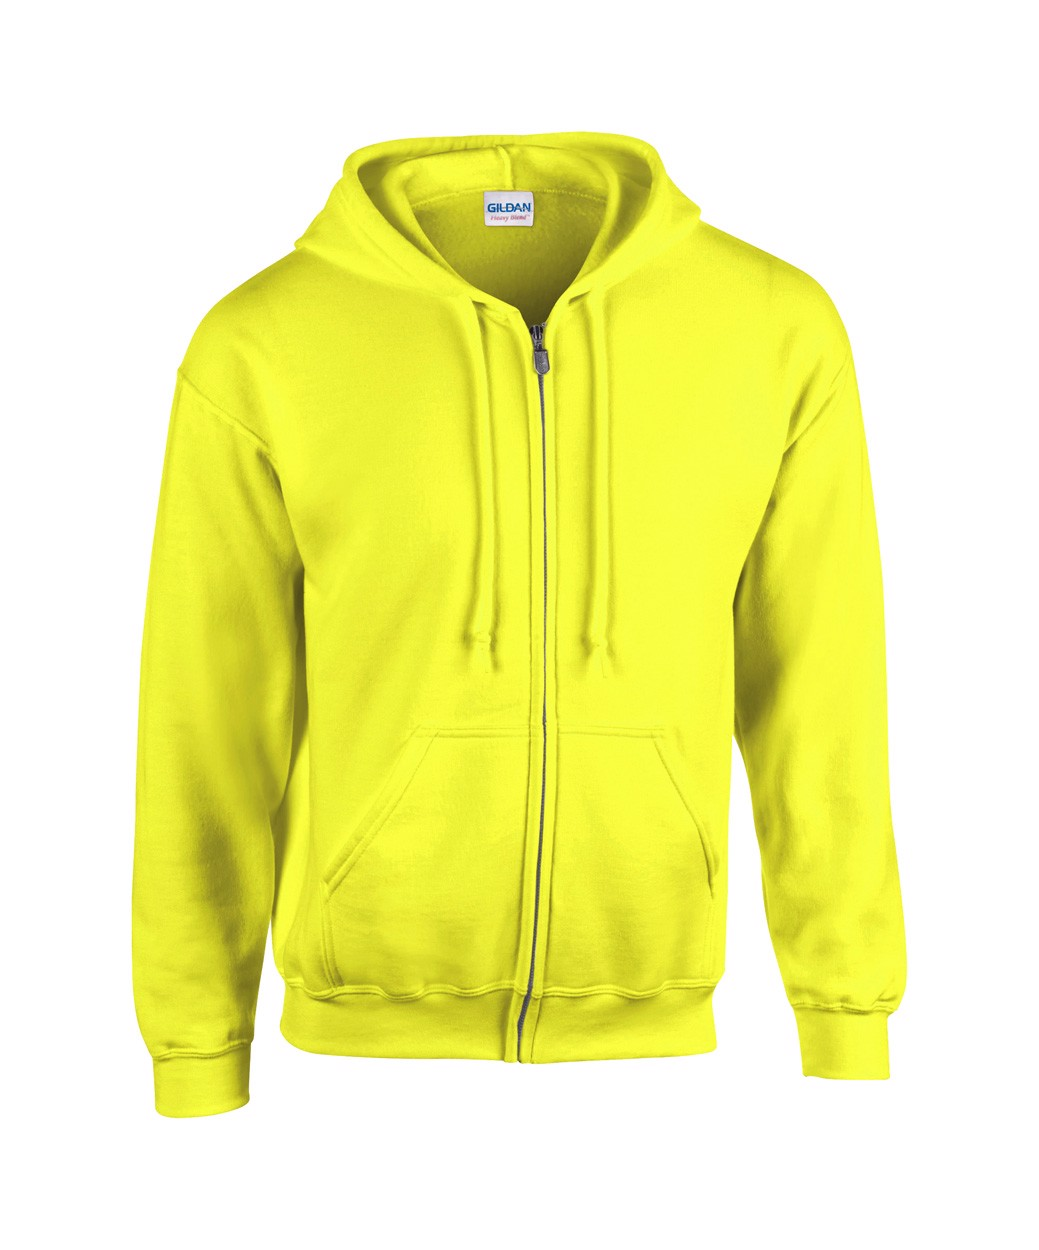 Mikina HB Zip Hooded - Fluorescenční Žlutá / XL